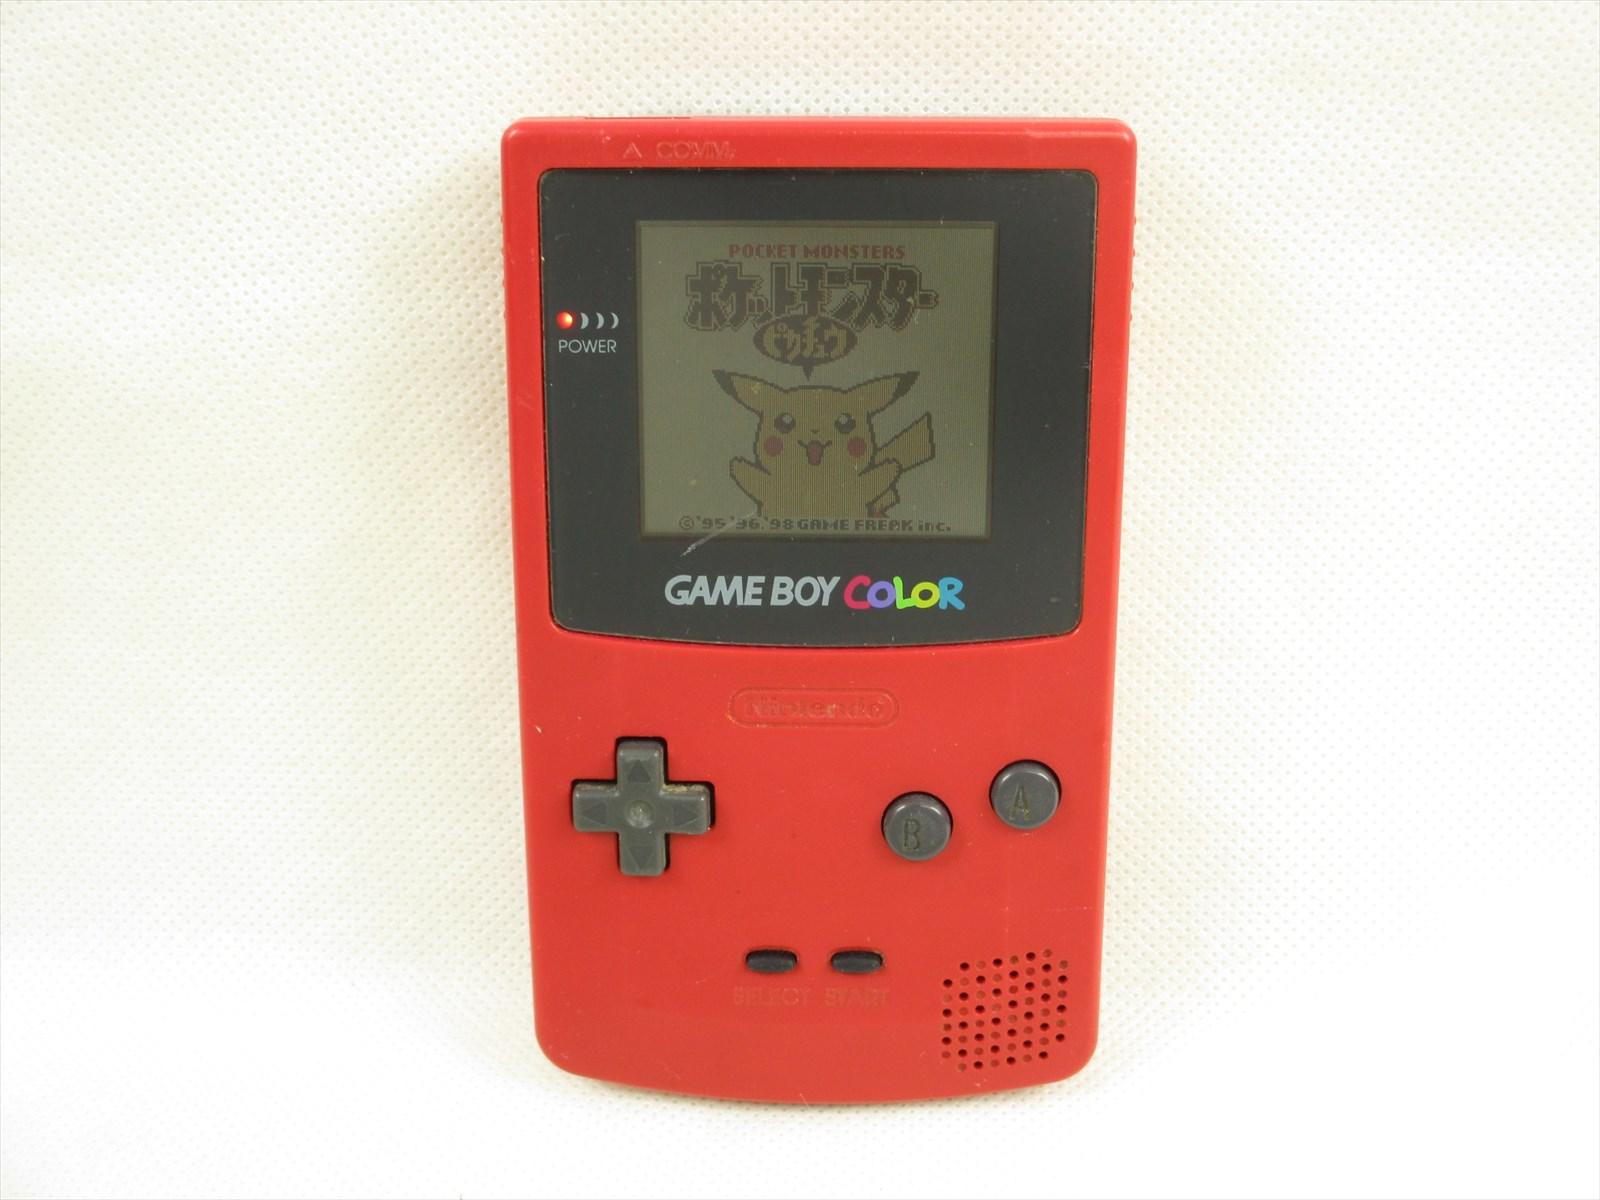 Game boy color japan - Game Boy Color Red Console System Nintendo Cgb 001 Ref 1513 Gameboy Japan Gb